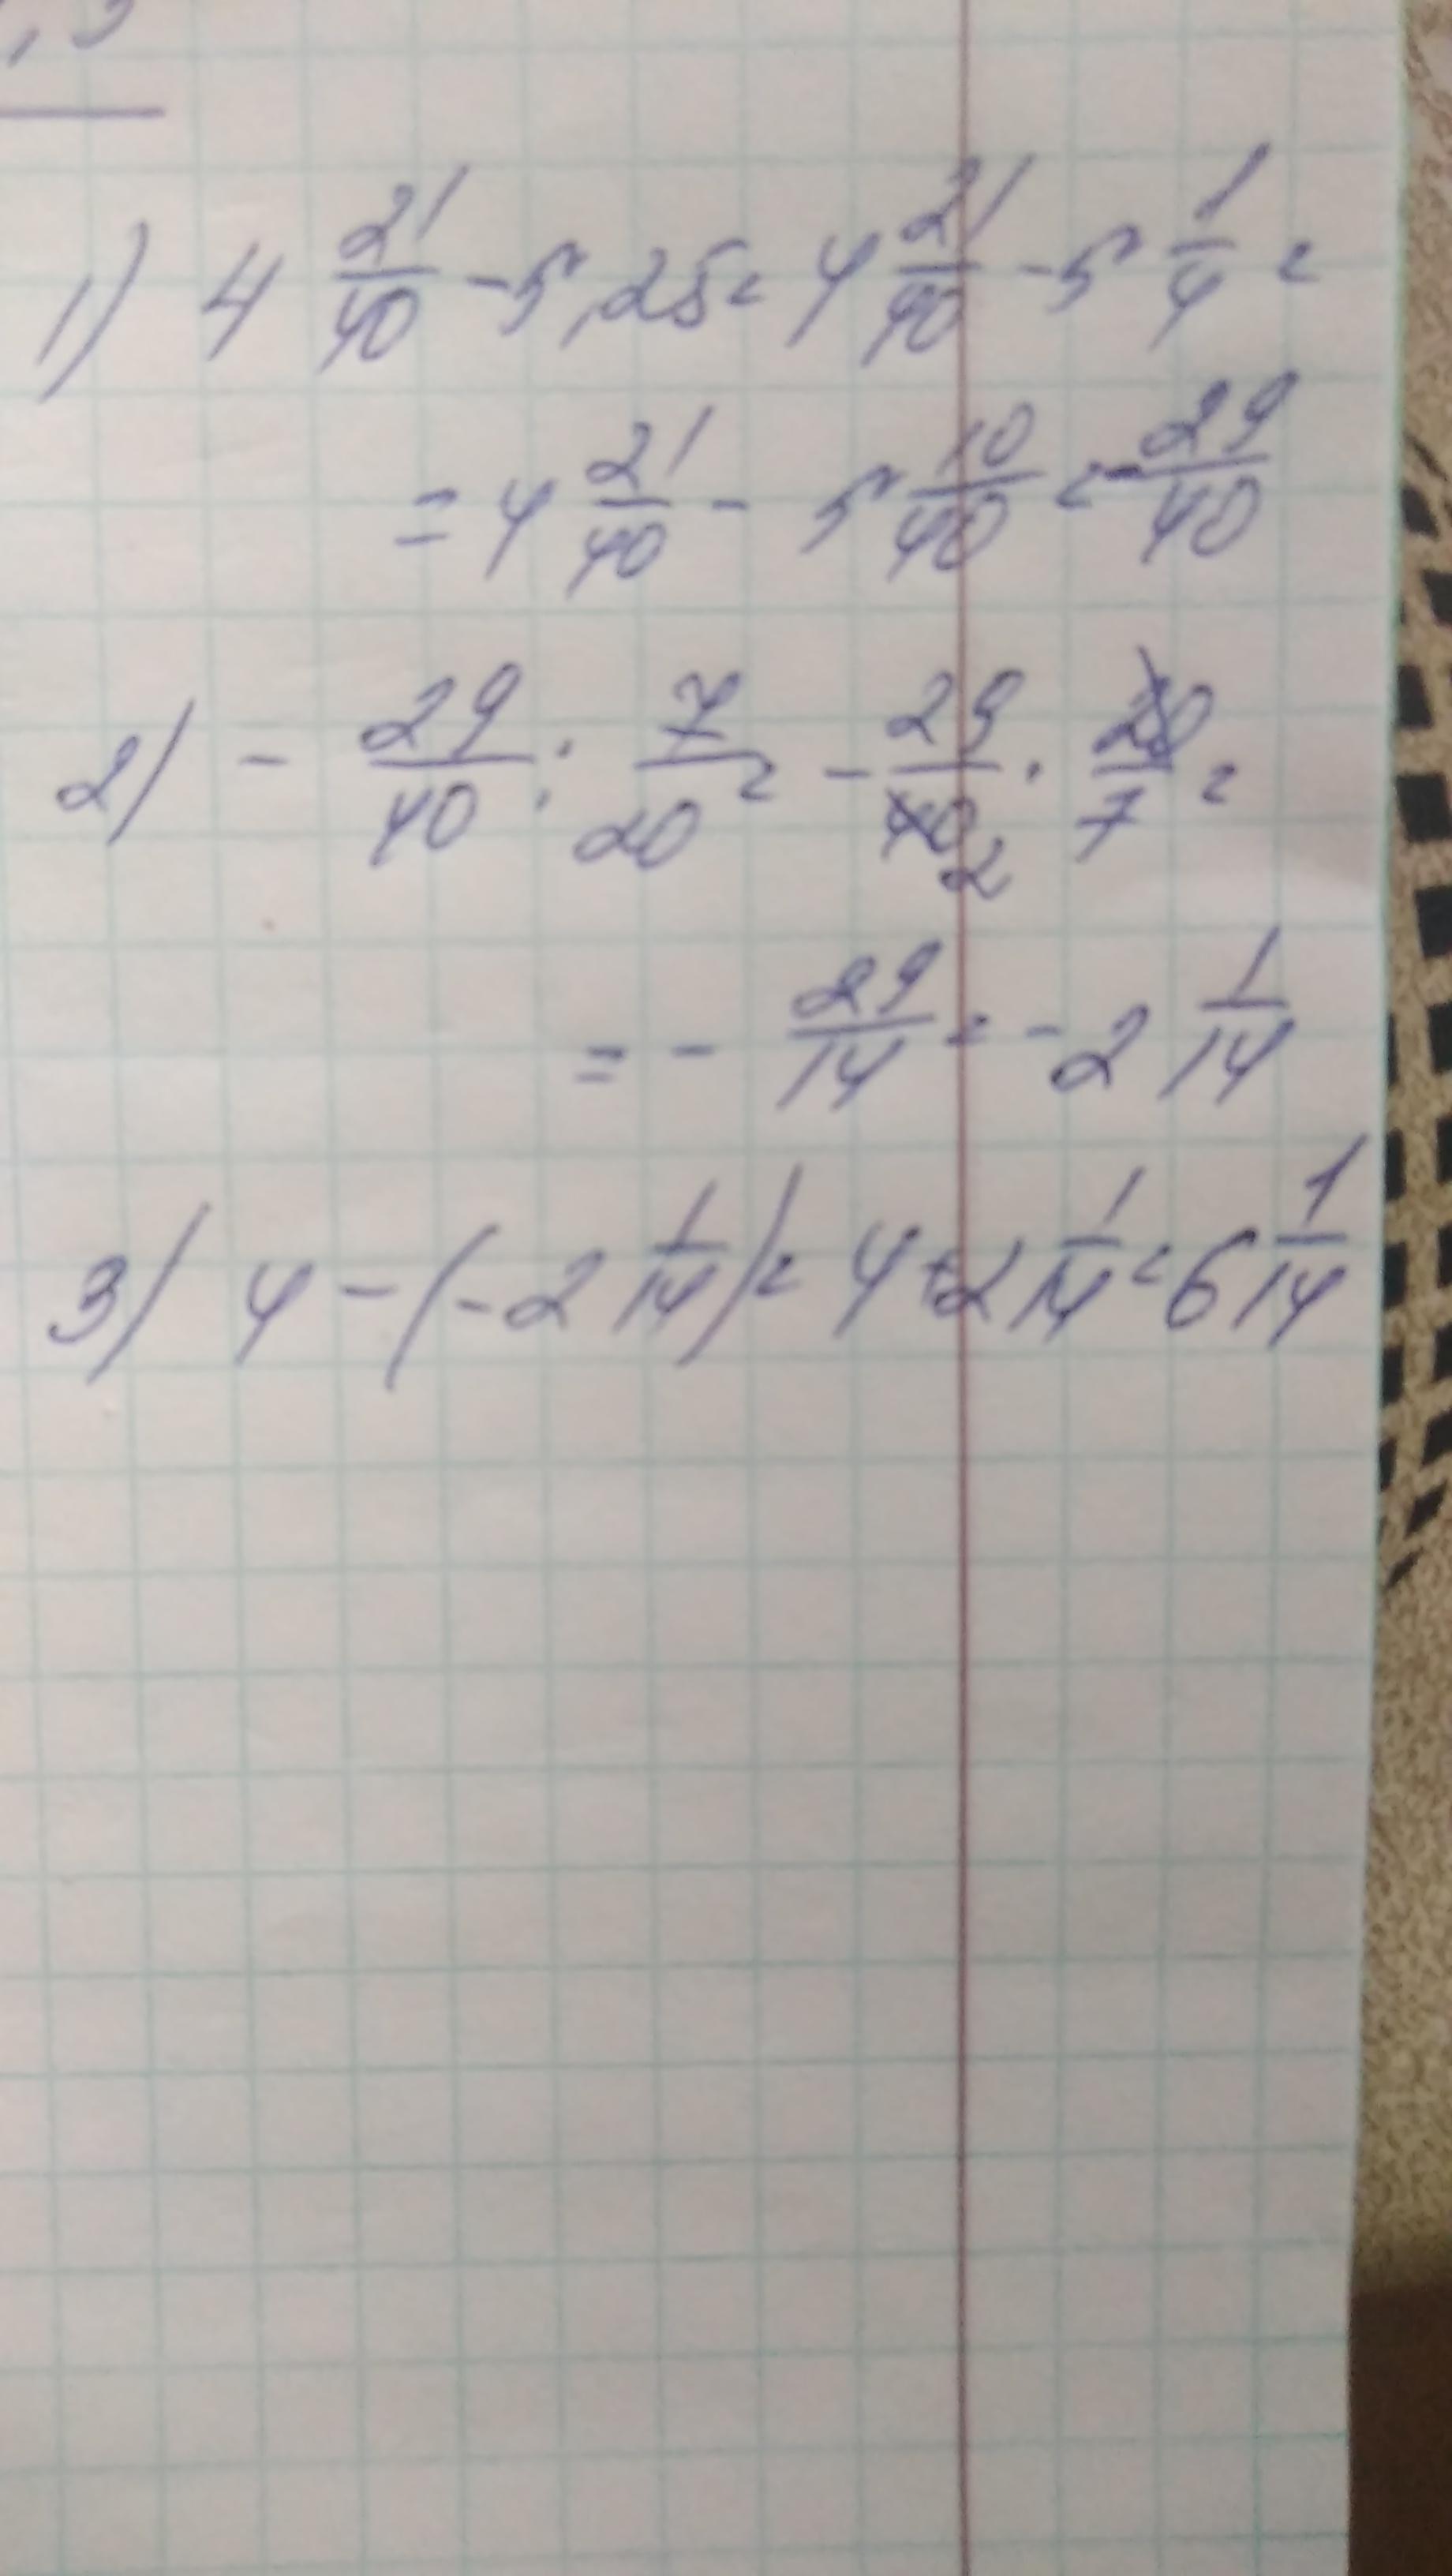 4-(4 21/40-5,25) : 7/20